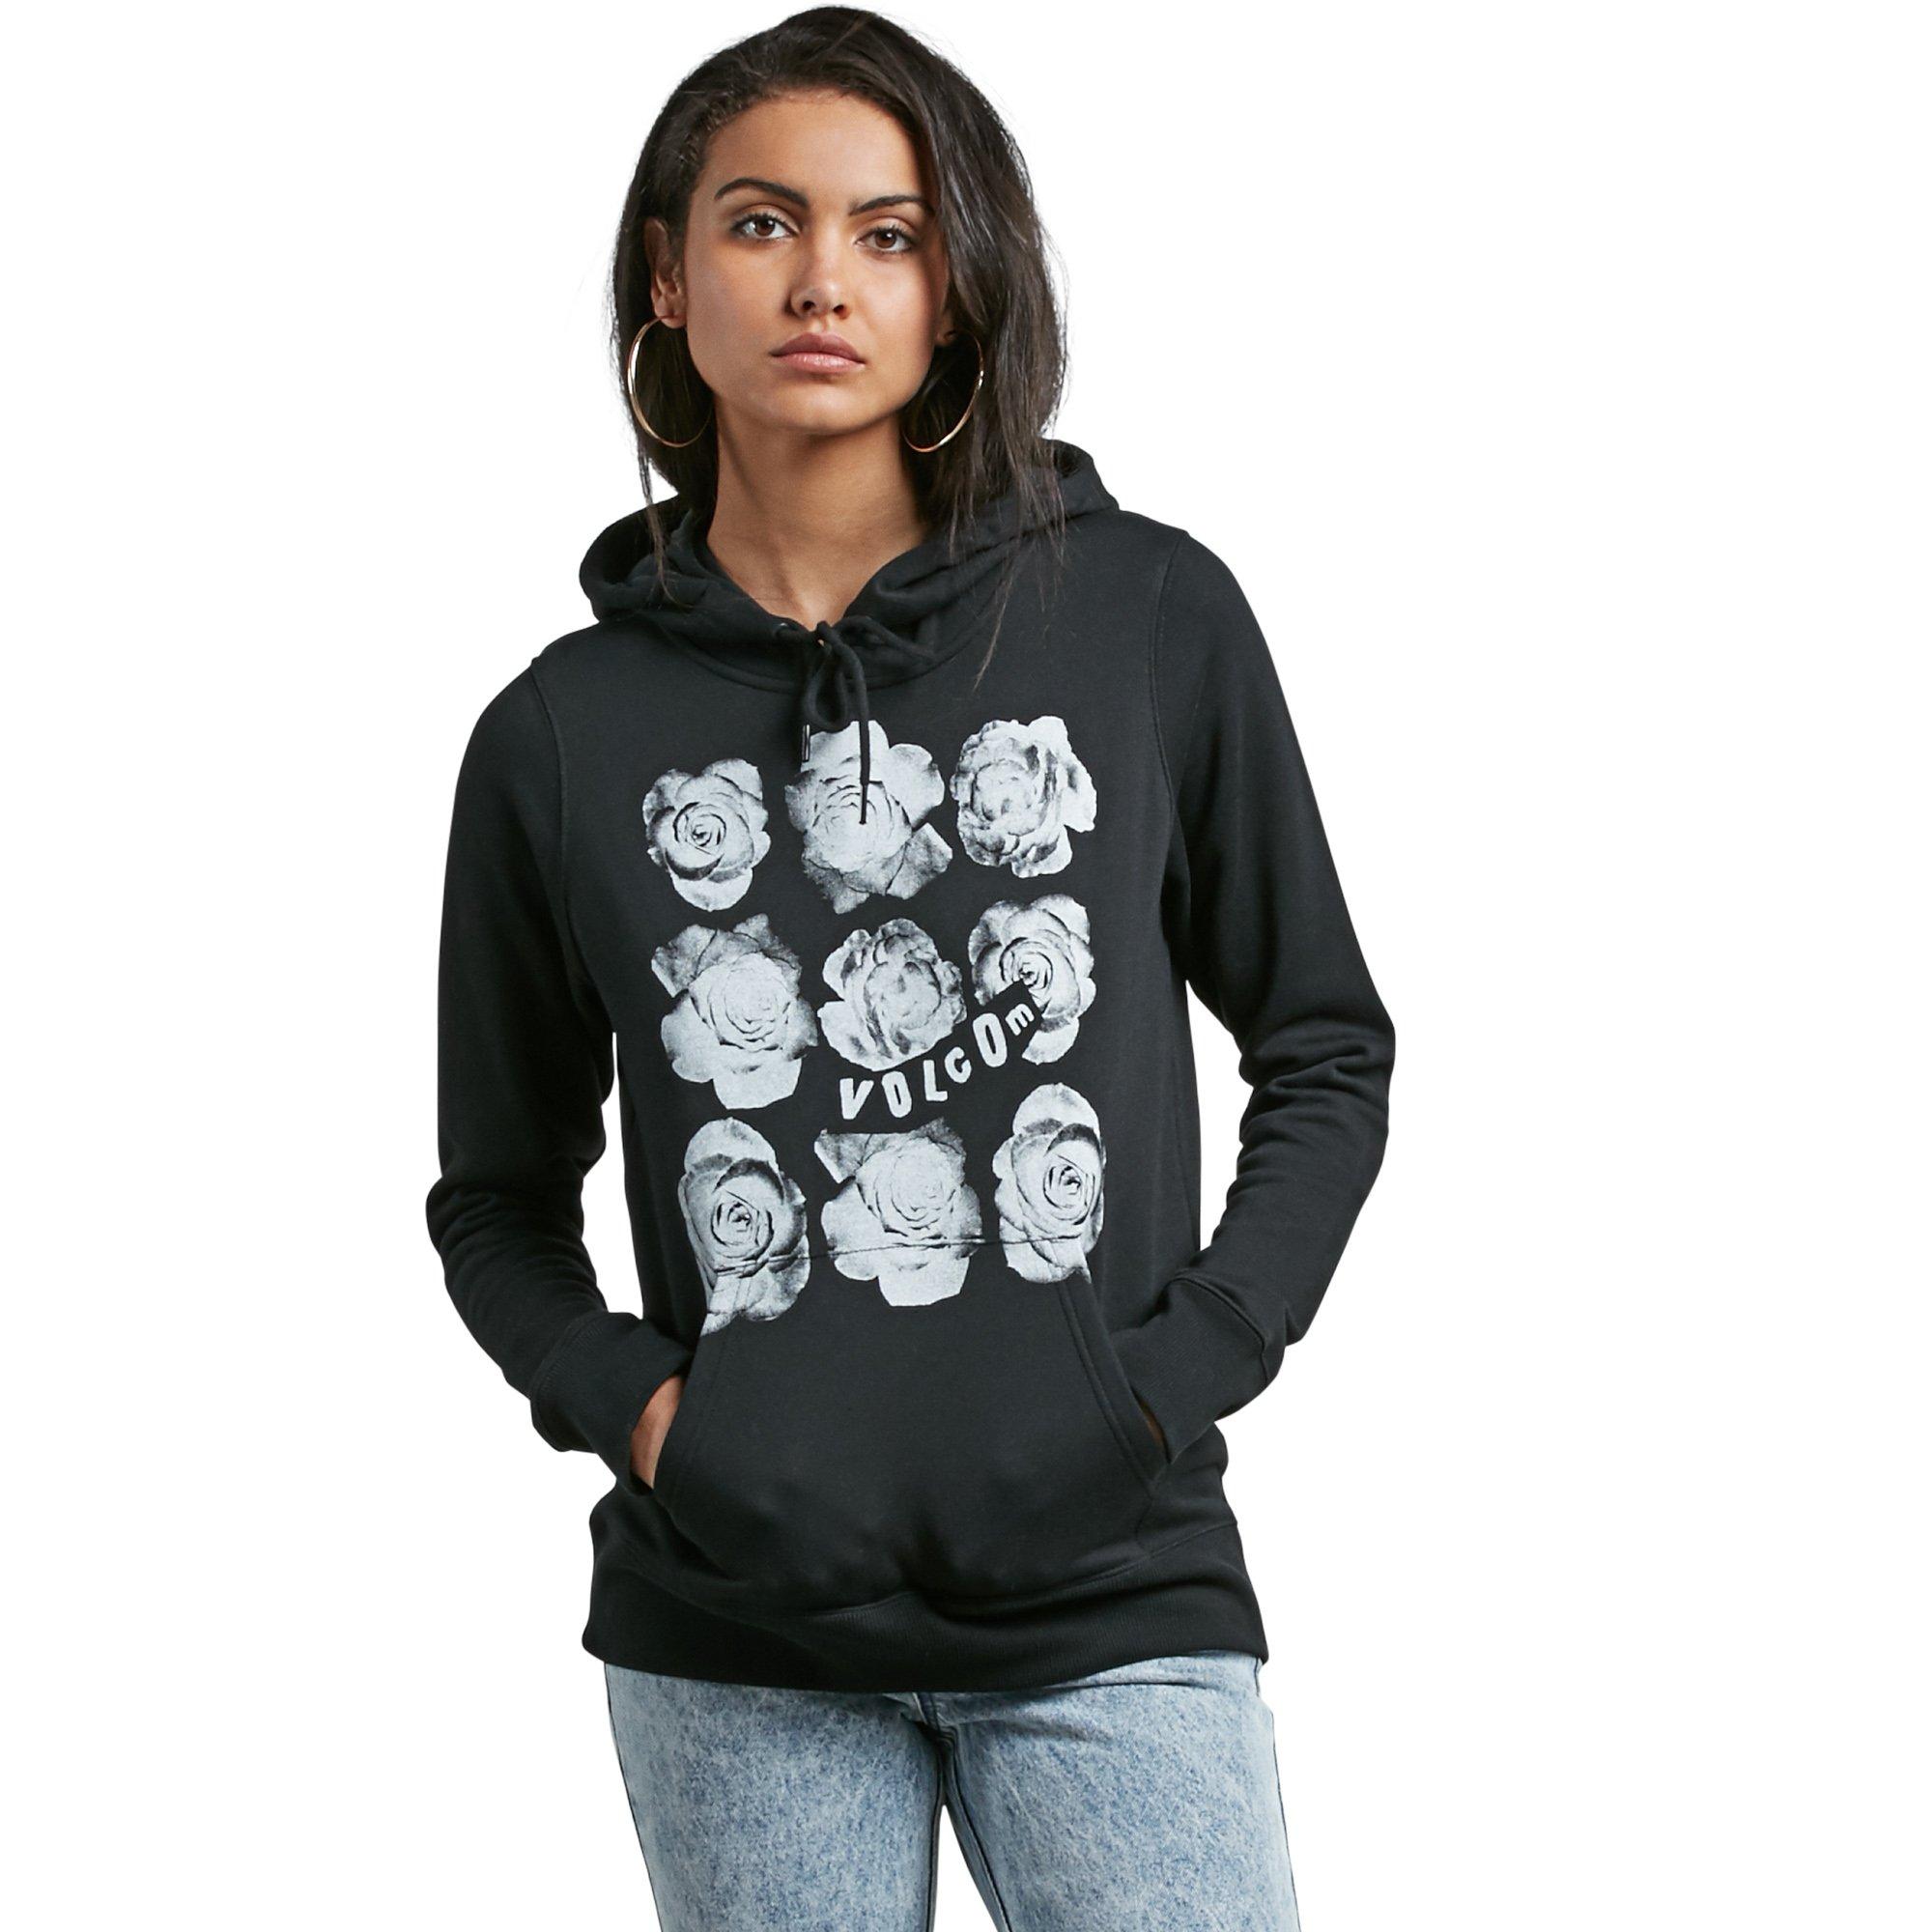 Volcom Junior's Vol Stone Pullover Lined Hoody Sweatshirt, Black, L